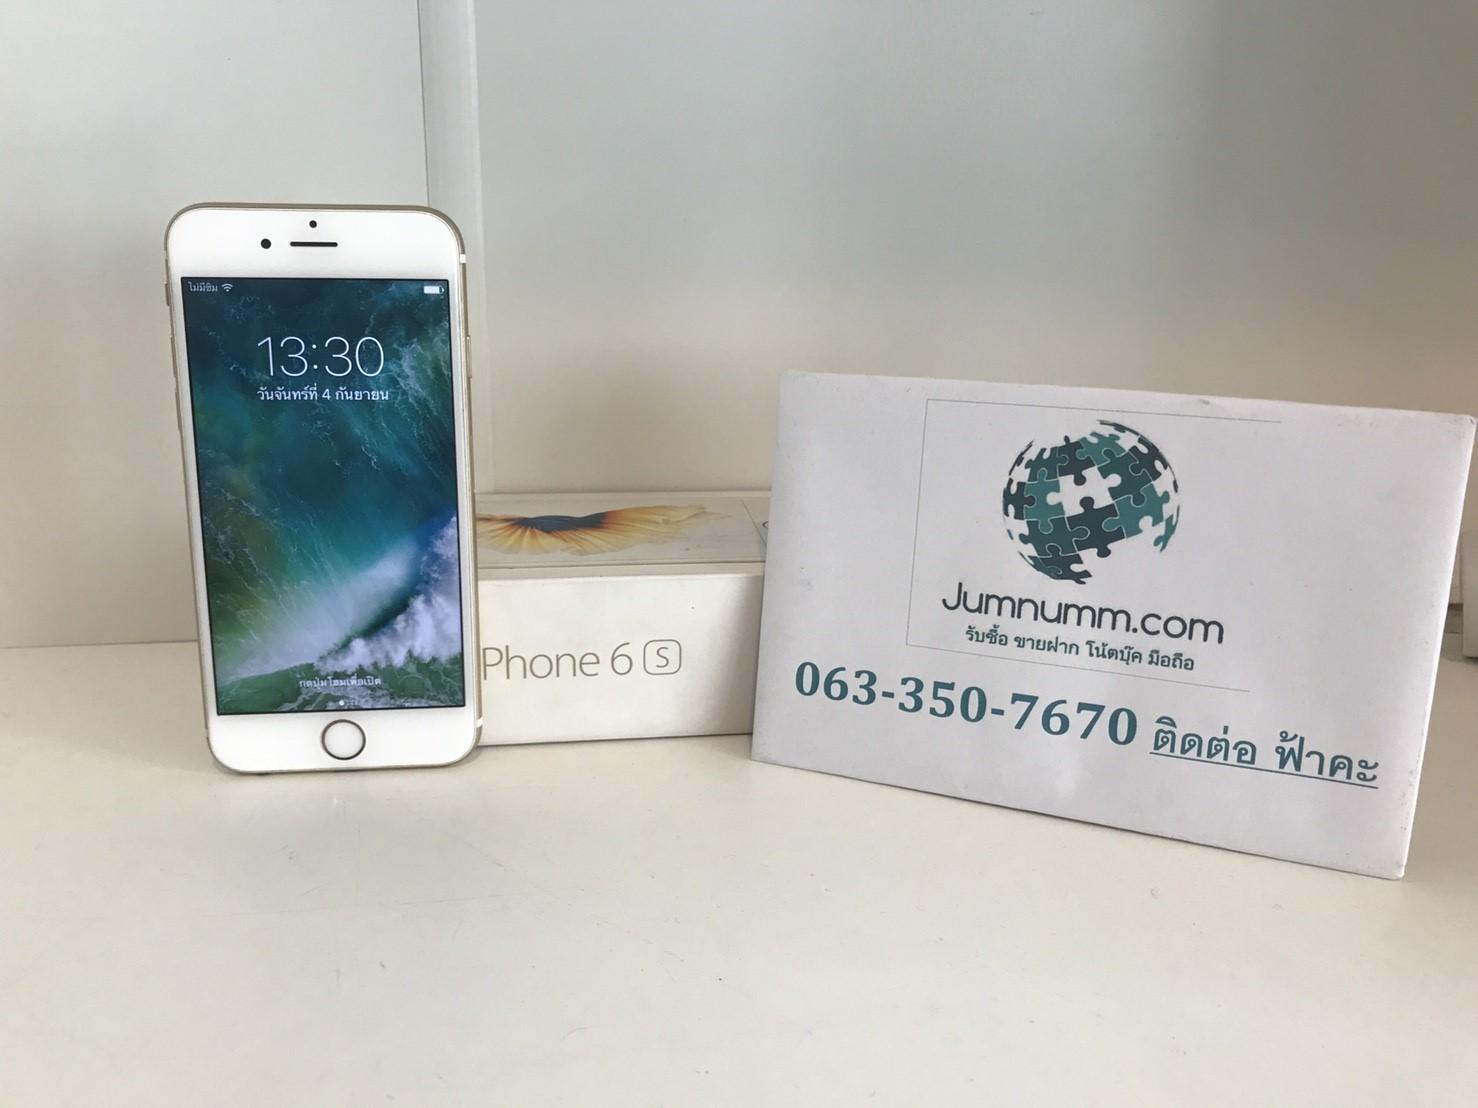 JMM-76 ขาย IPhone6s 16GB ราคา 10900 บาท